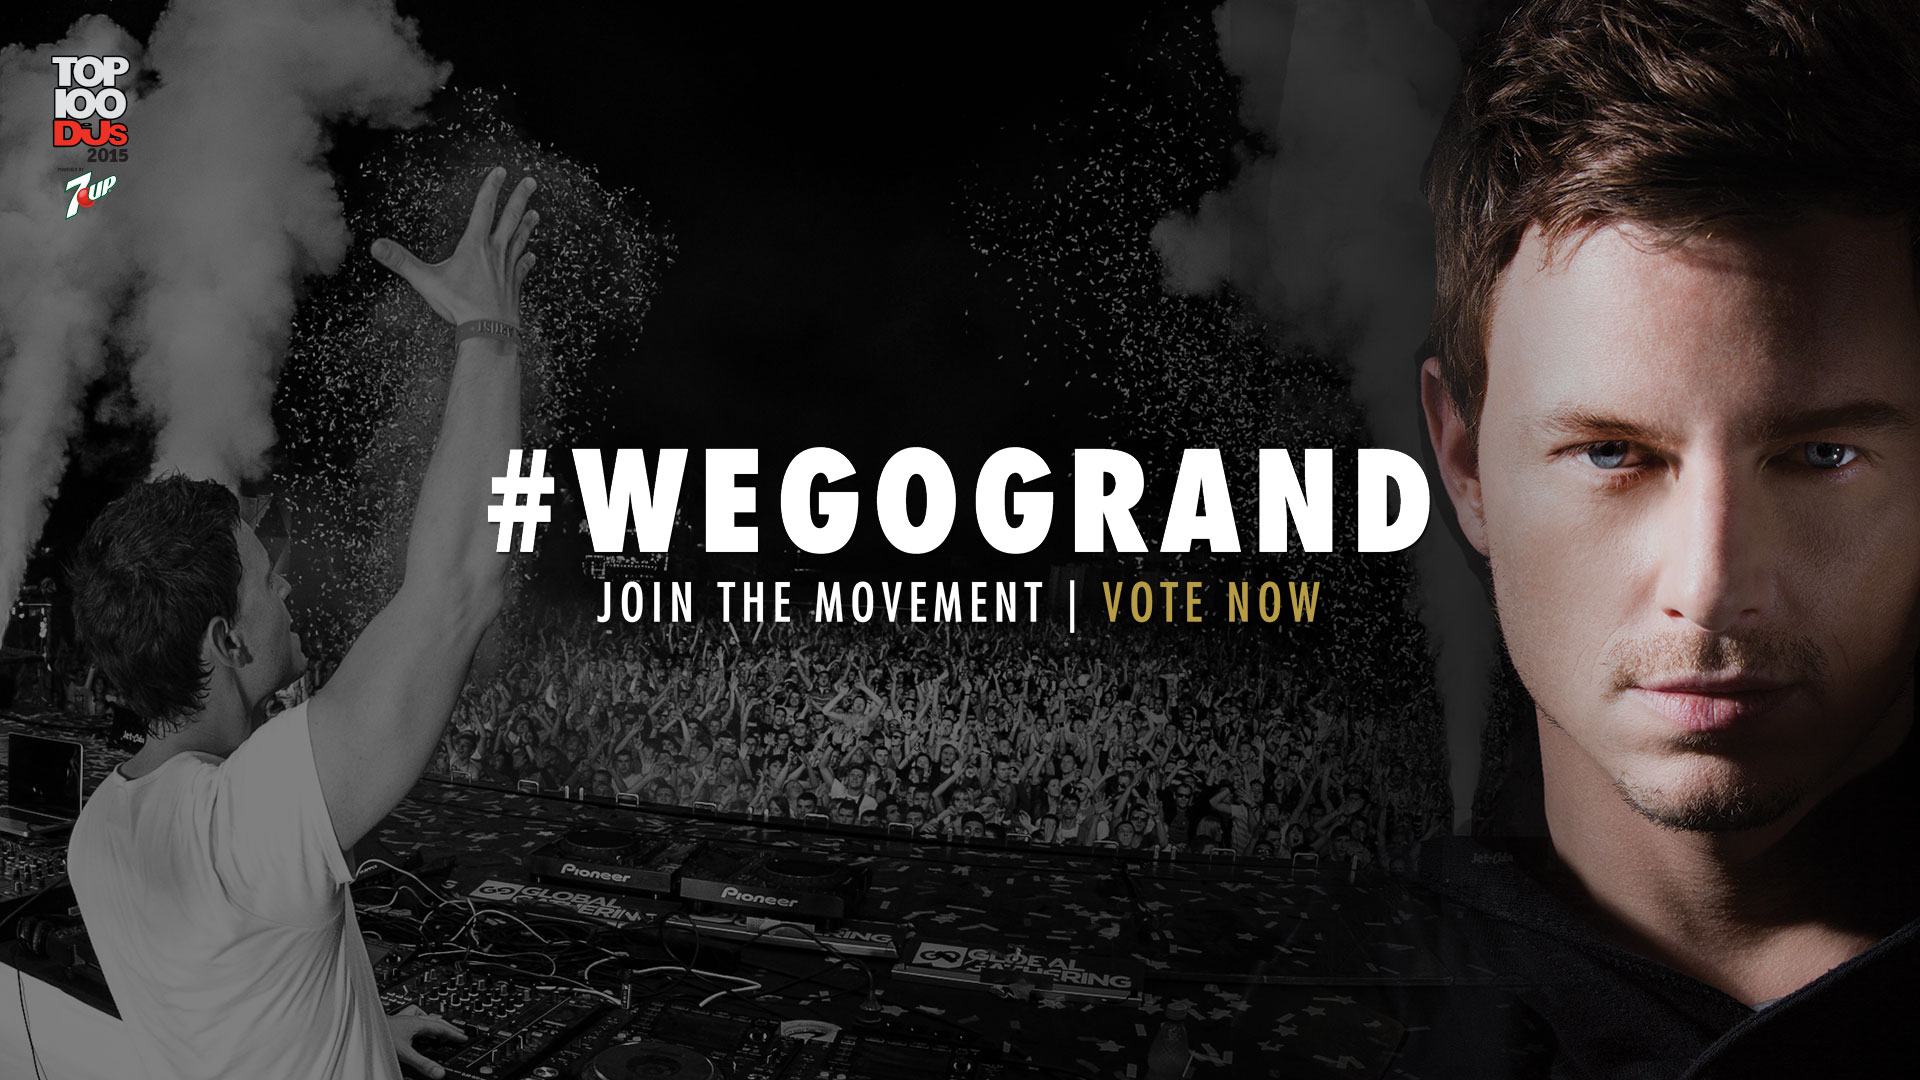 #WeGoGRAND